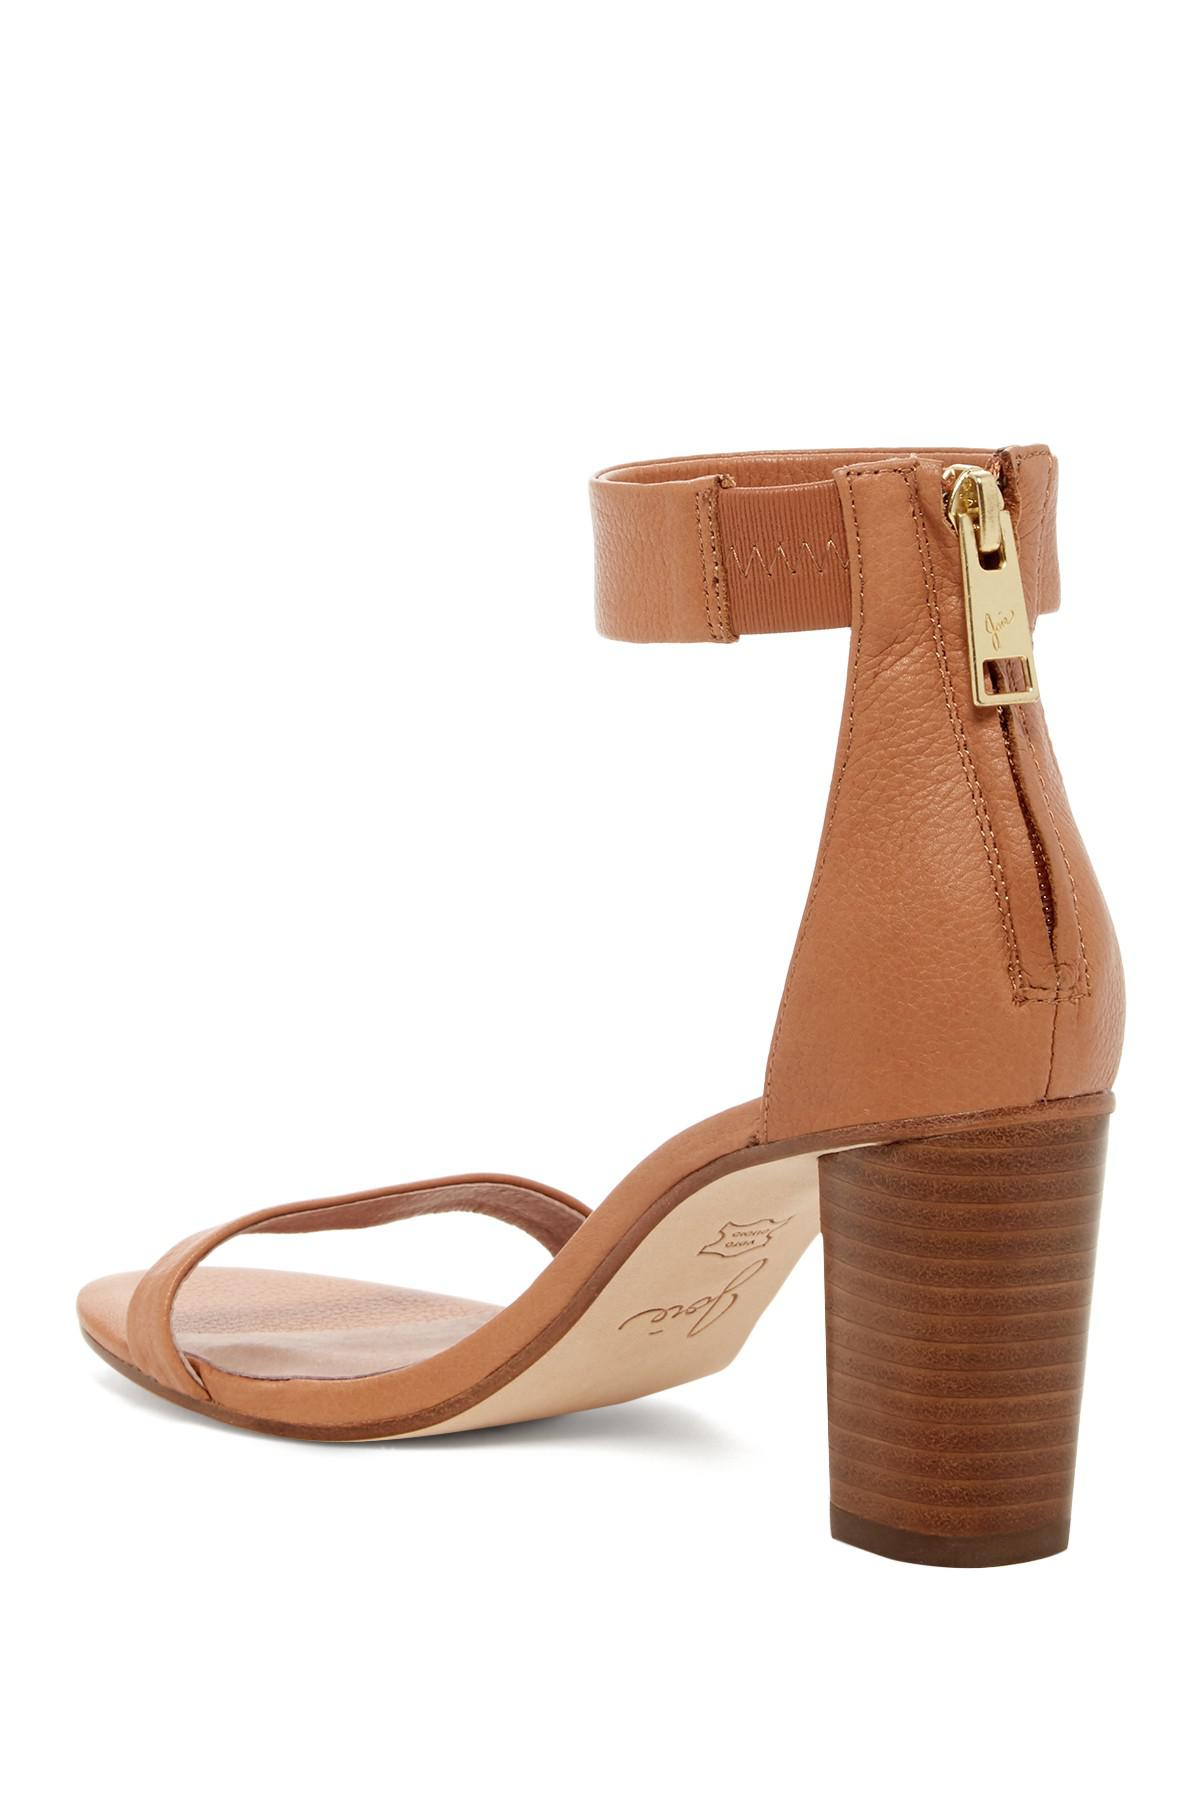 Joie Loueze High Heel Sandal s6agWN